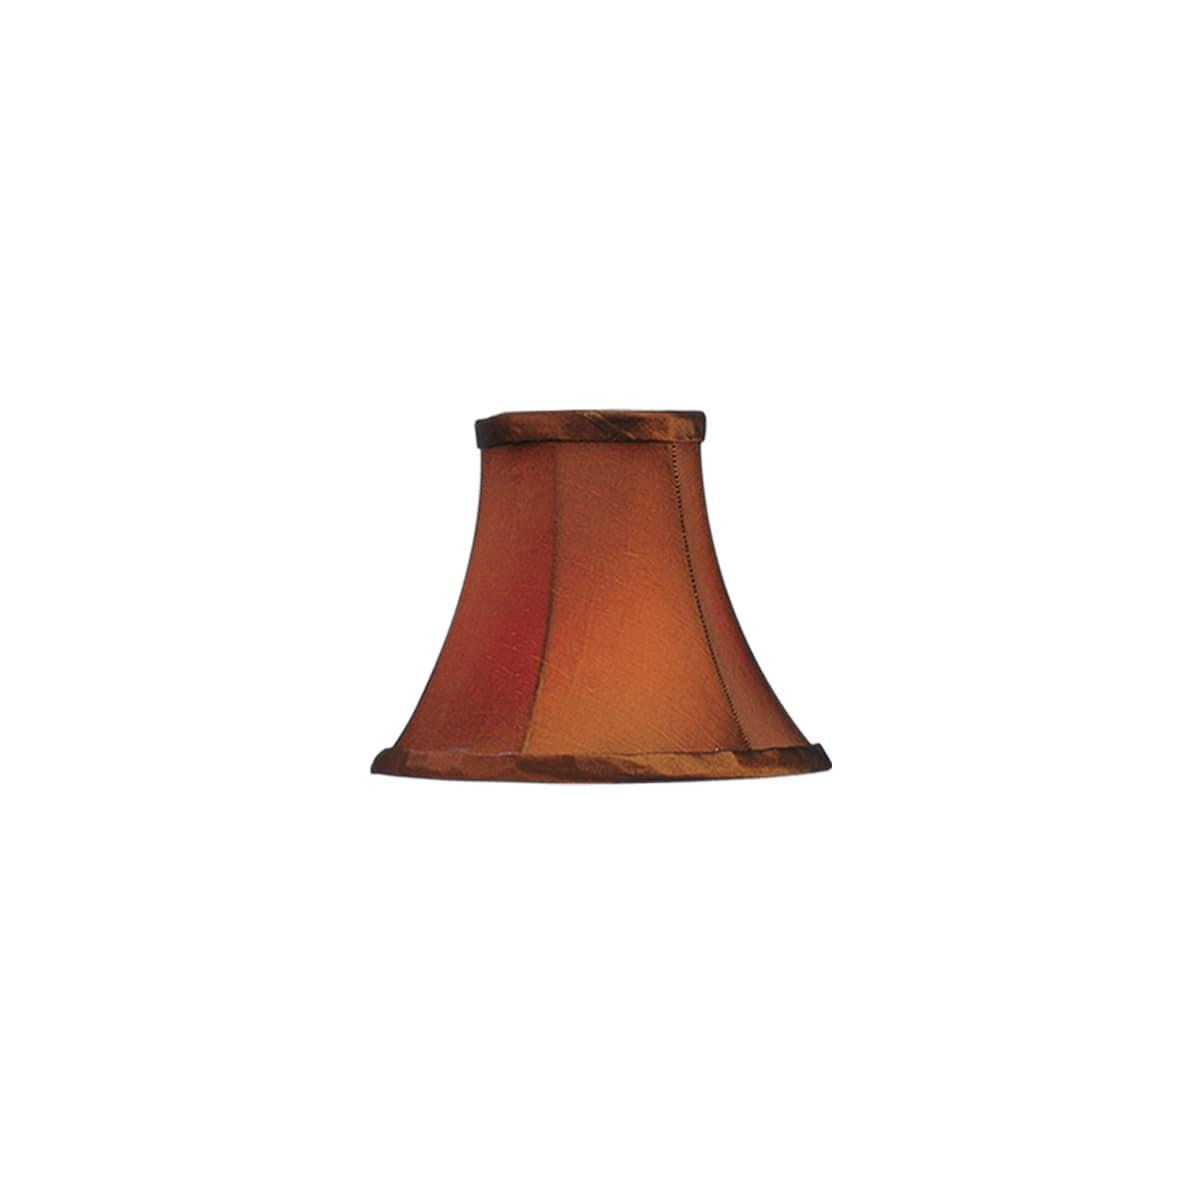 Livex Lighting S220 Brown Silk Bell Clip Shade Chandelier Shade With Brown Silk Bell Clip Shade From Chandelier Shade Series